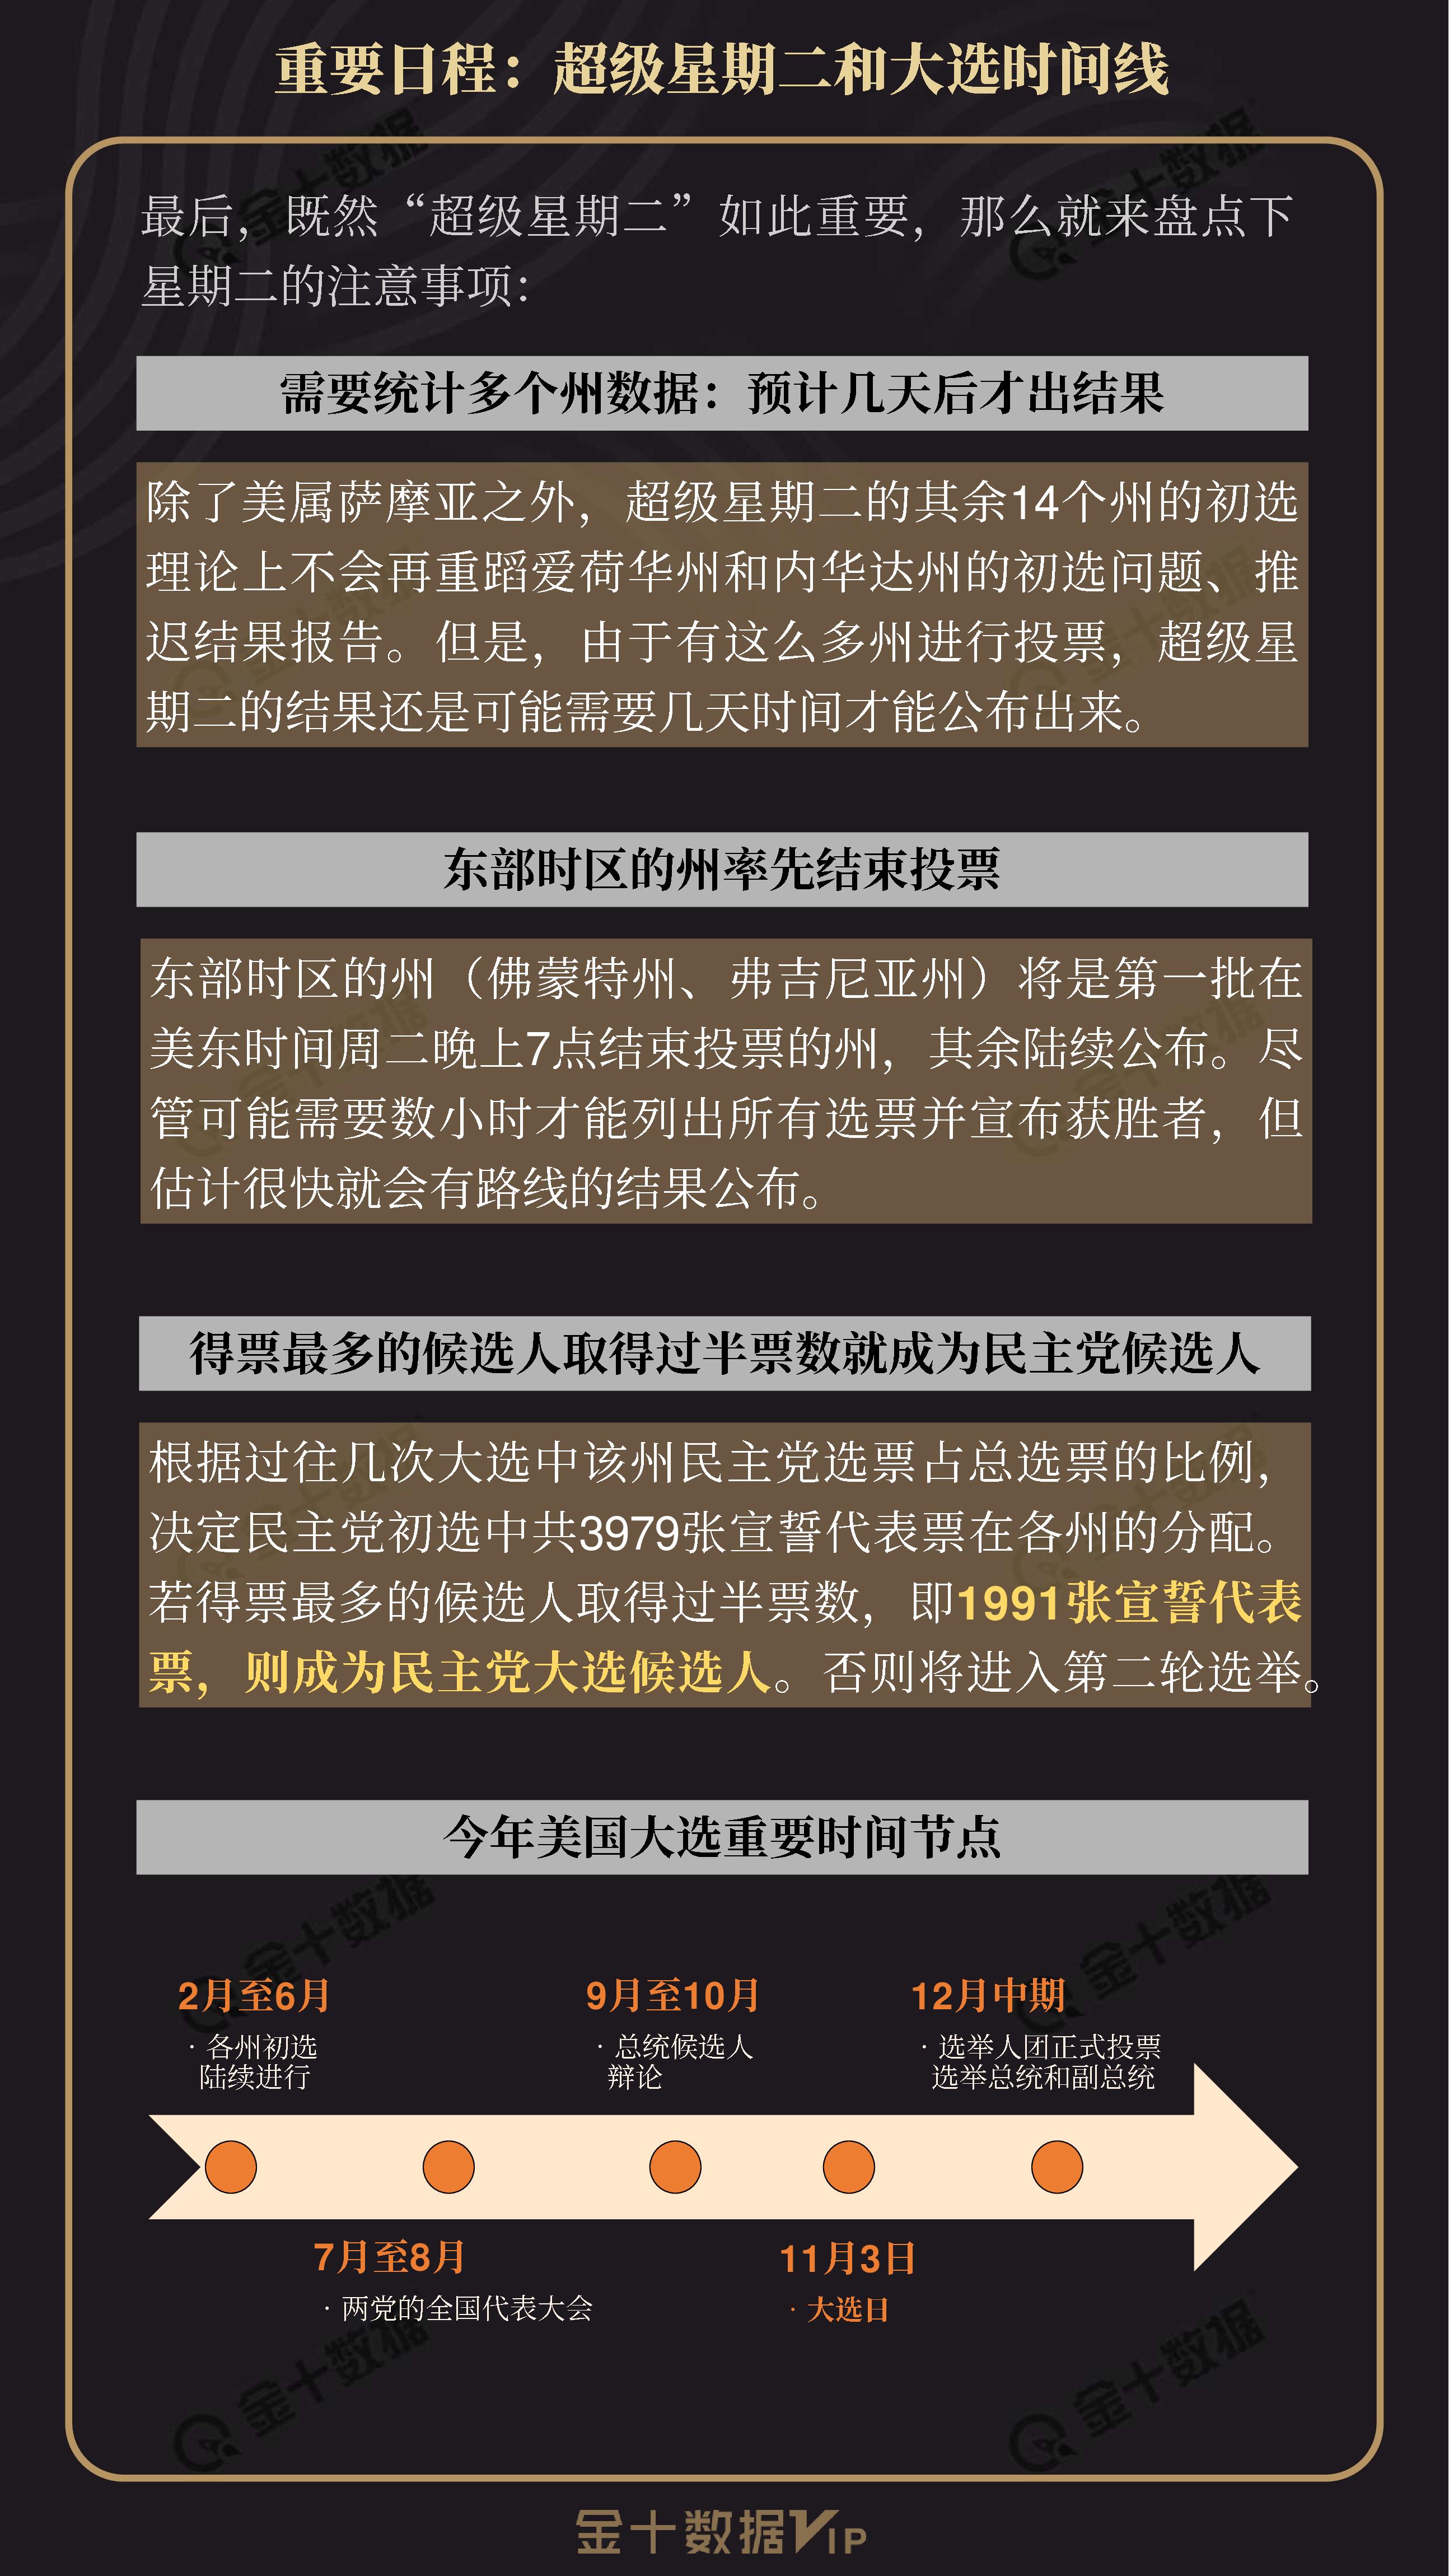 pdf分解